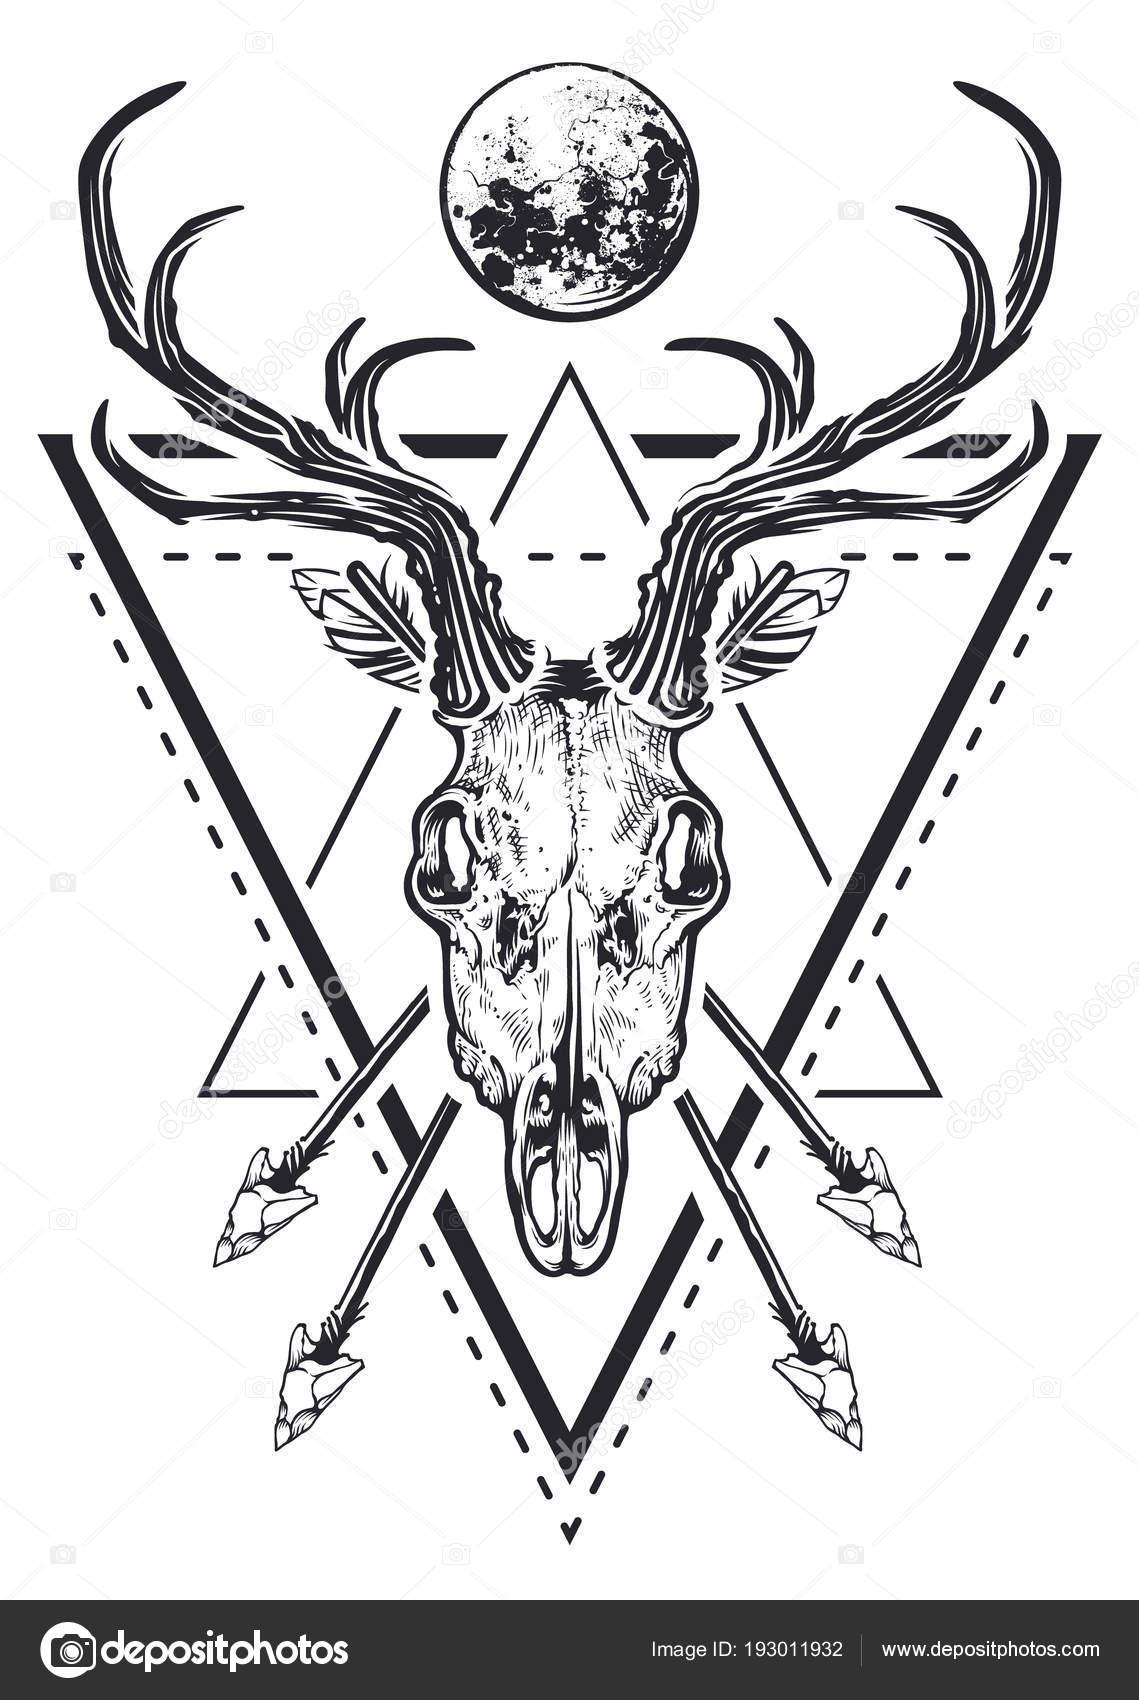 Oak vintage base. Carved deer skull Geometric Tattoo style